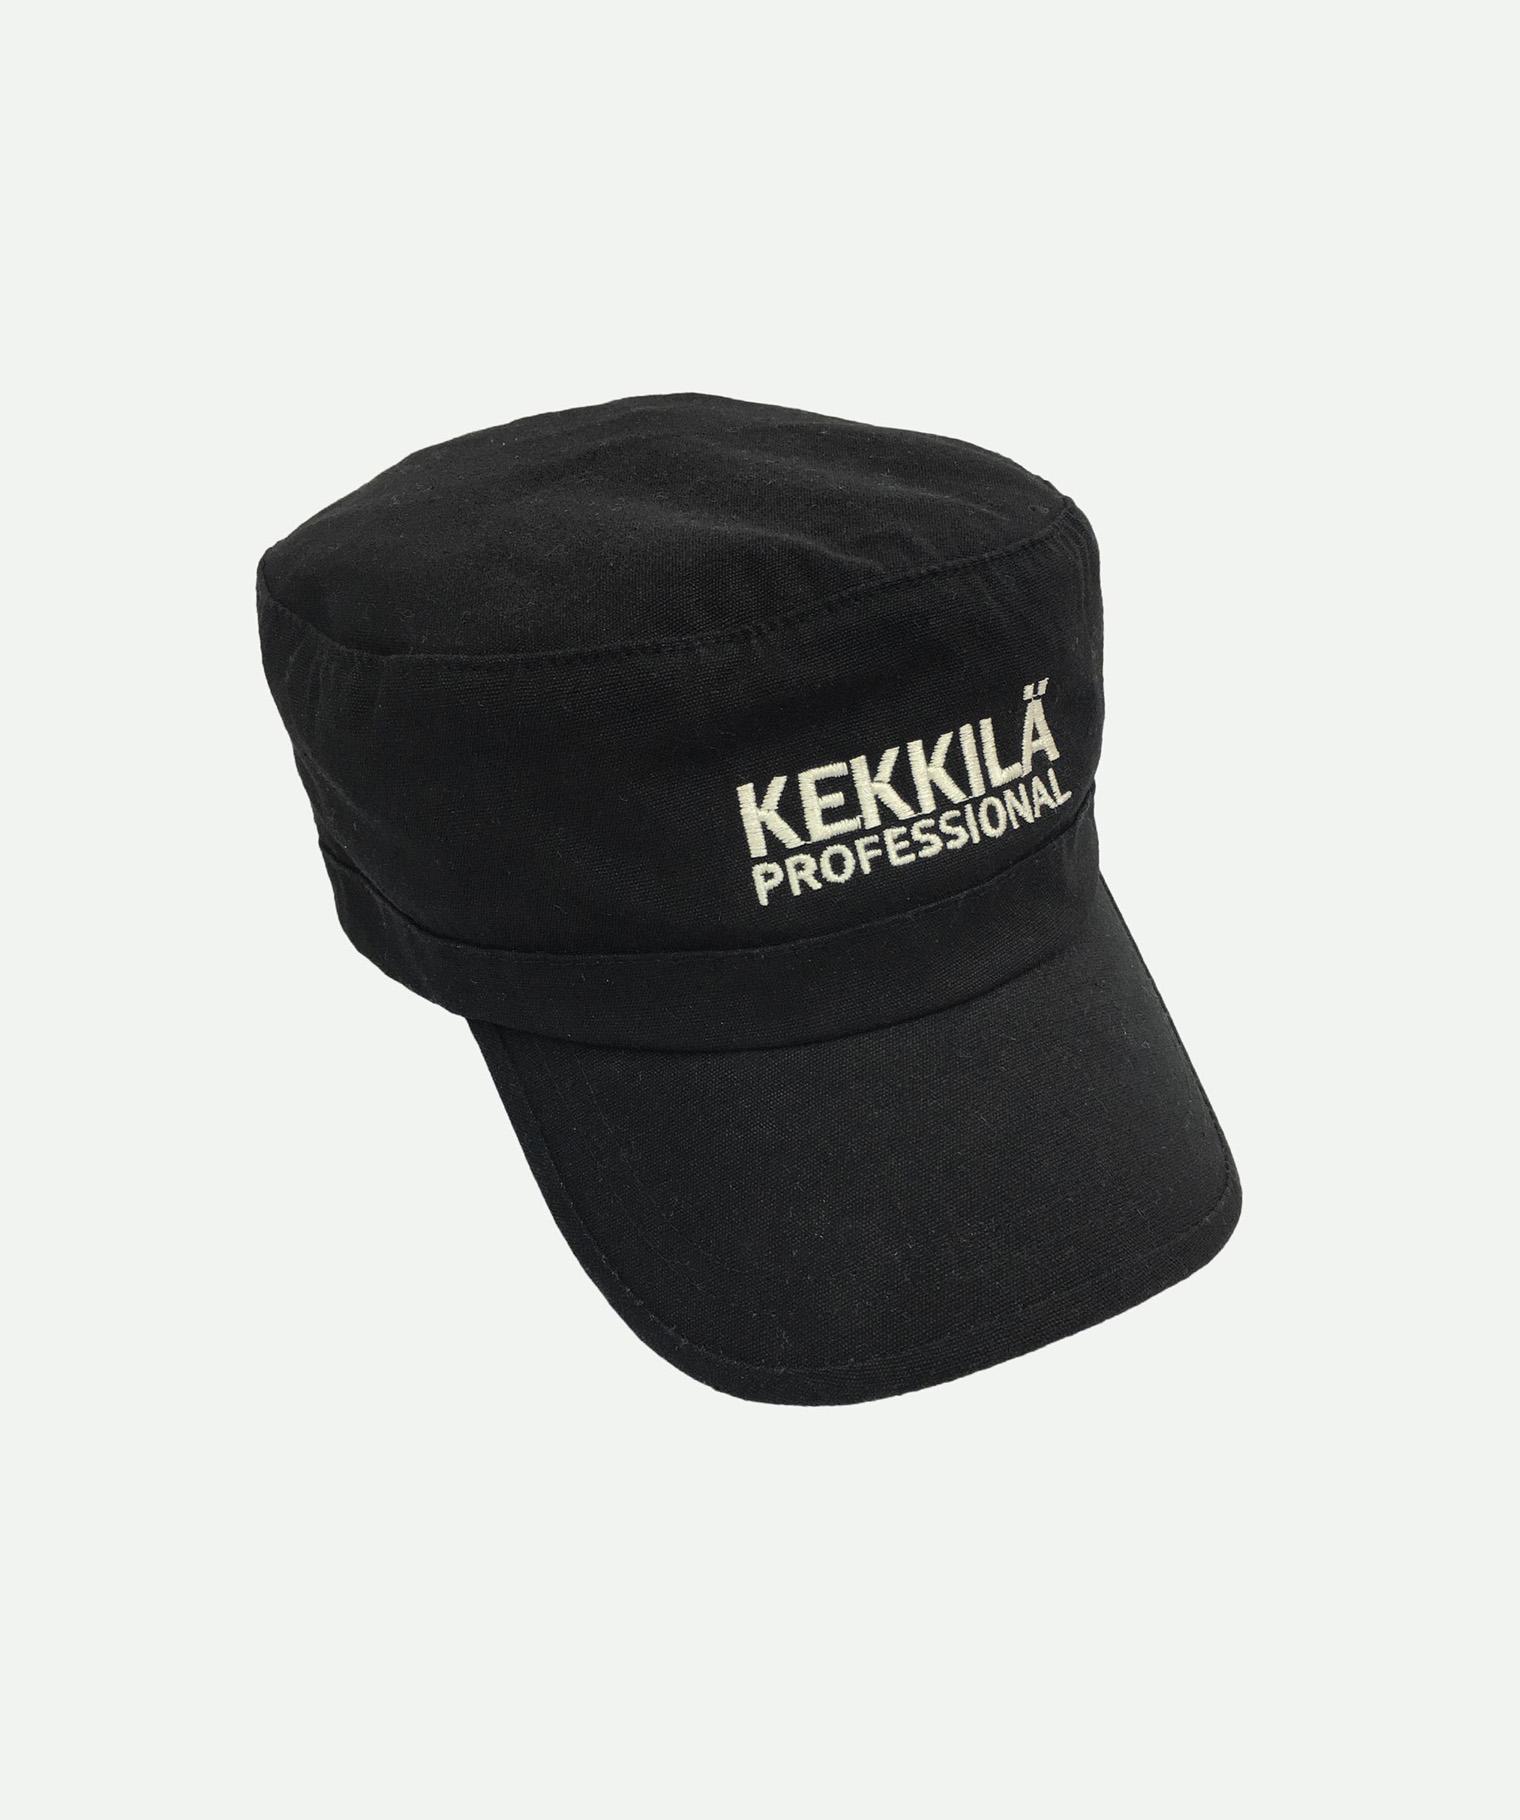 Gorra bordada cubana negra